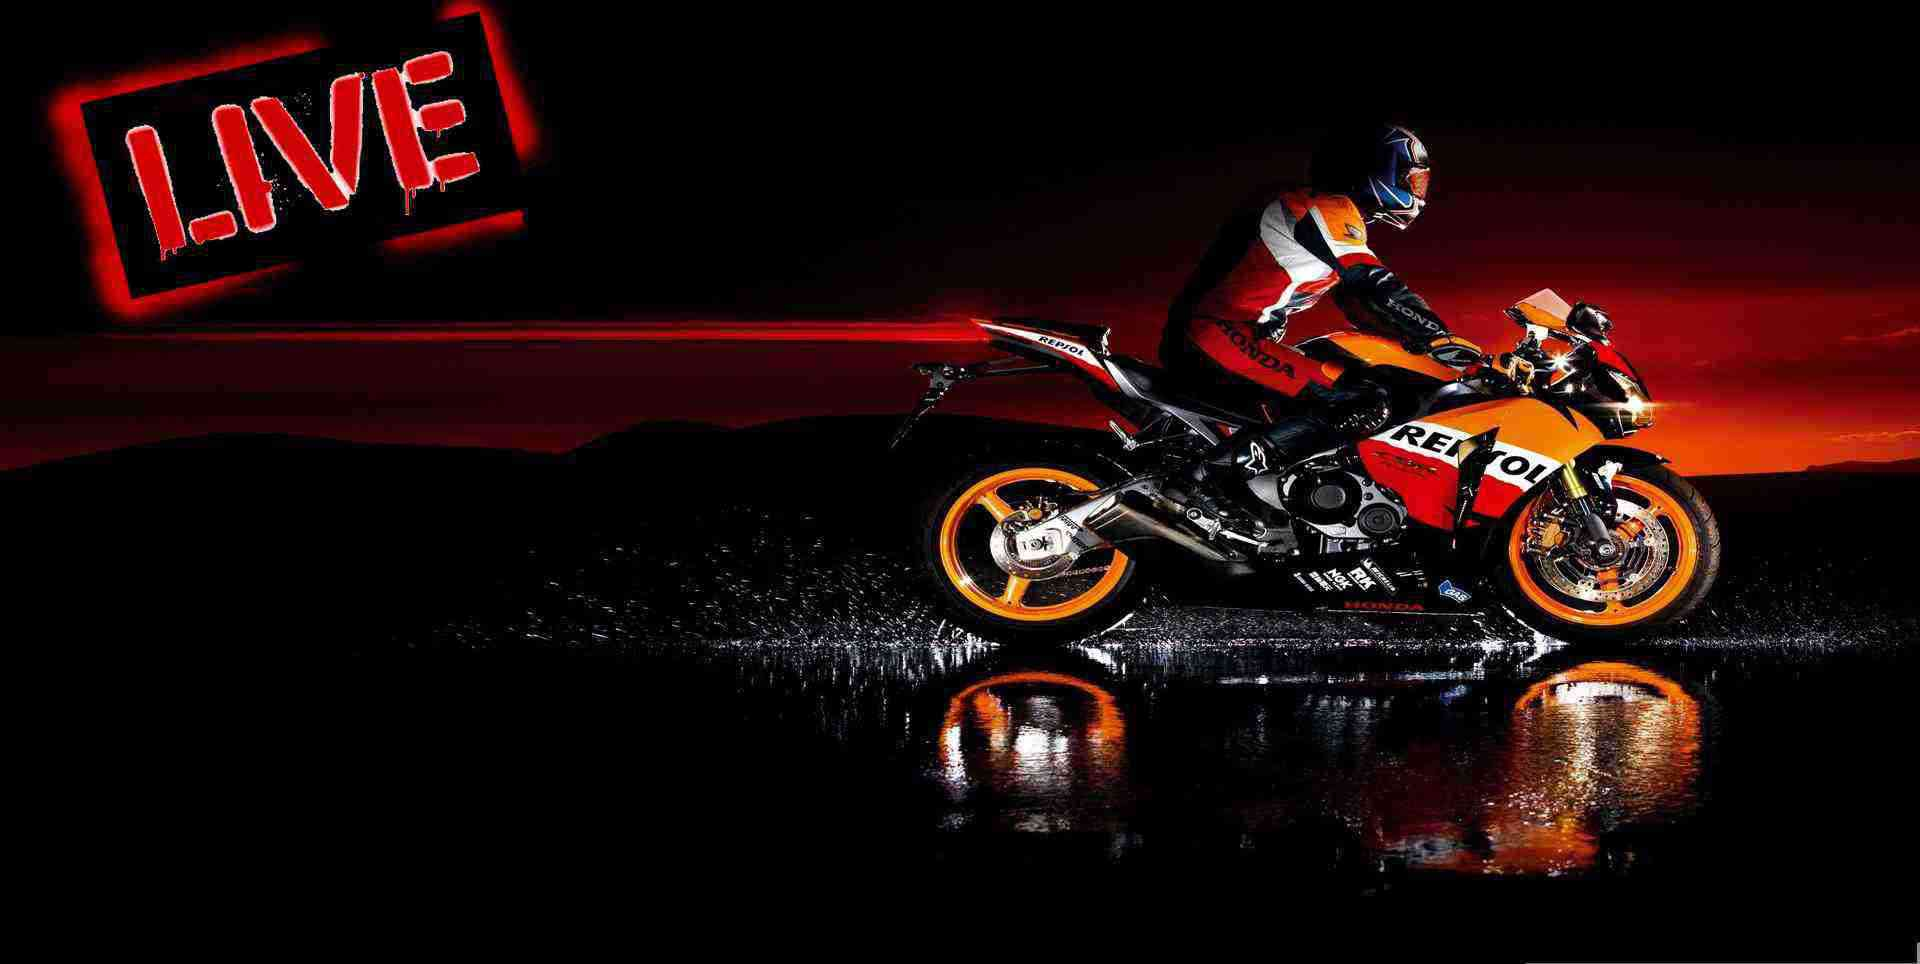 live-2014-american-motogp-grand-prix-online